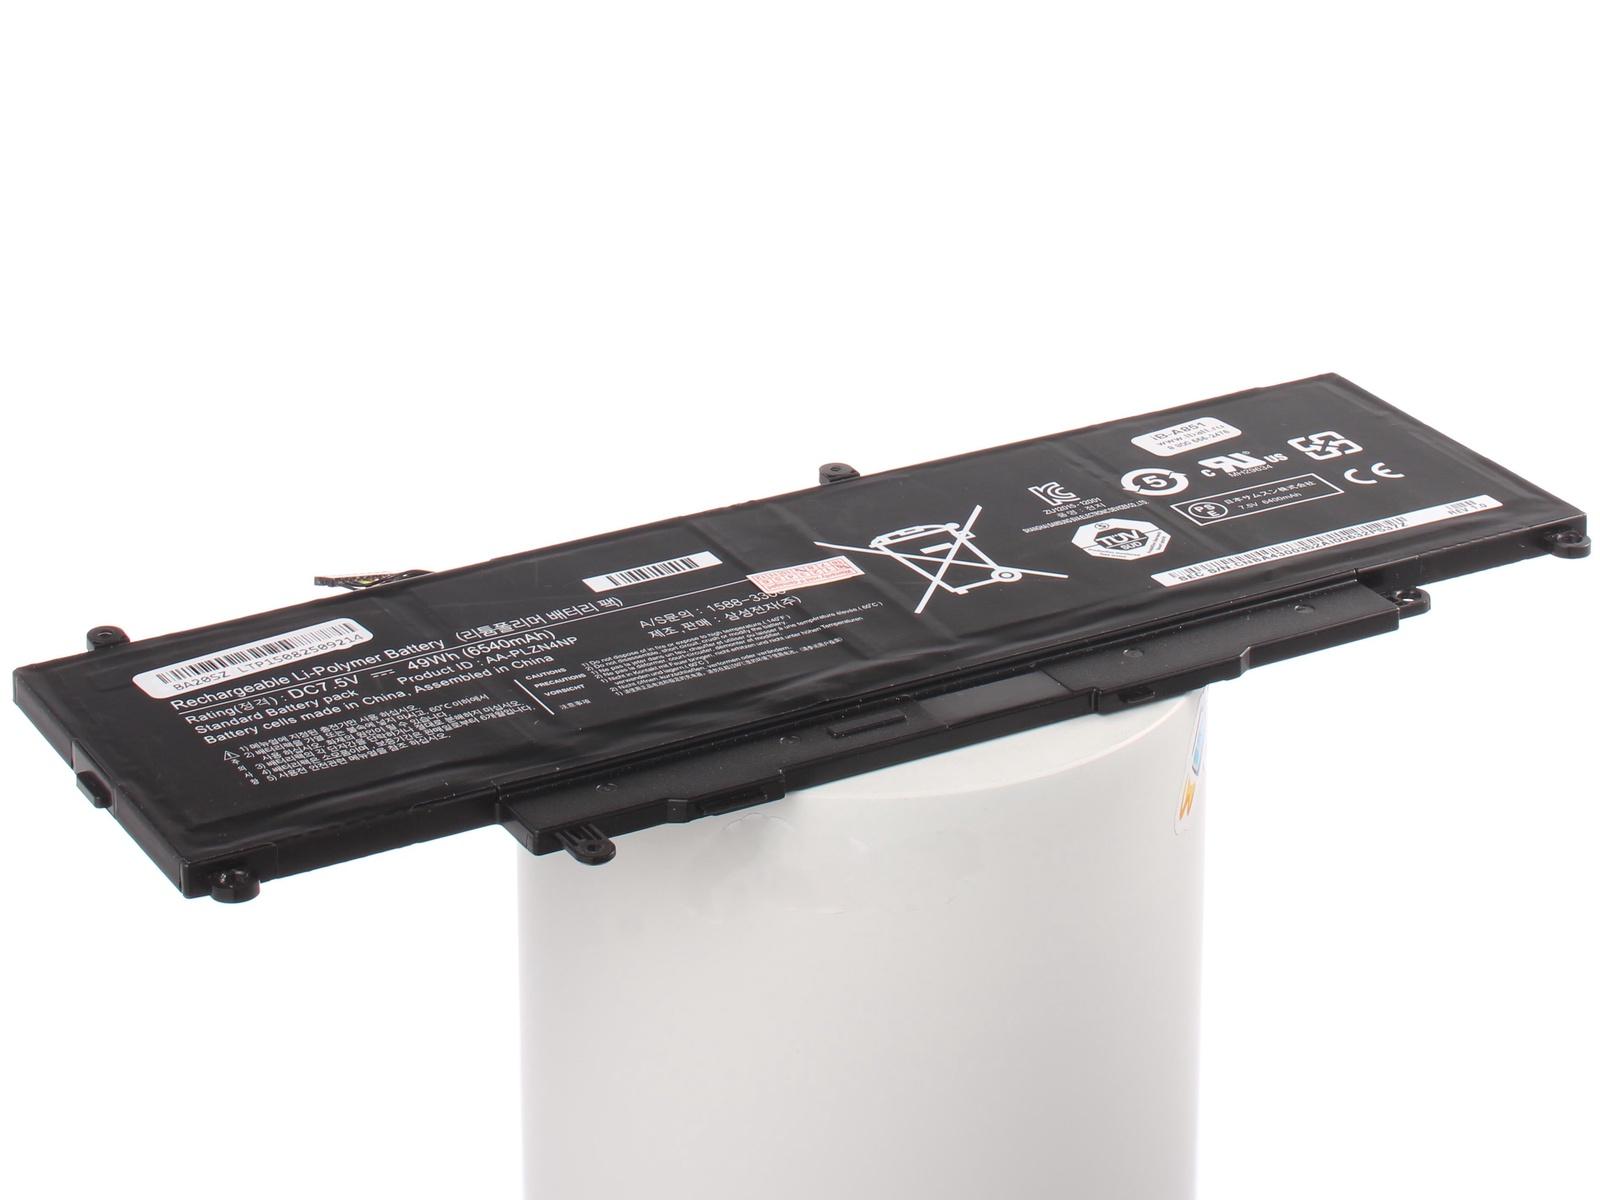 Аккумулятор для ноутбука iBatt Samsung AA-PLZN4NP, CS-SXE700NB скачать драйвера для ноутбука samsung